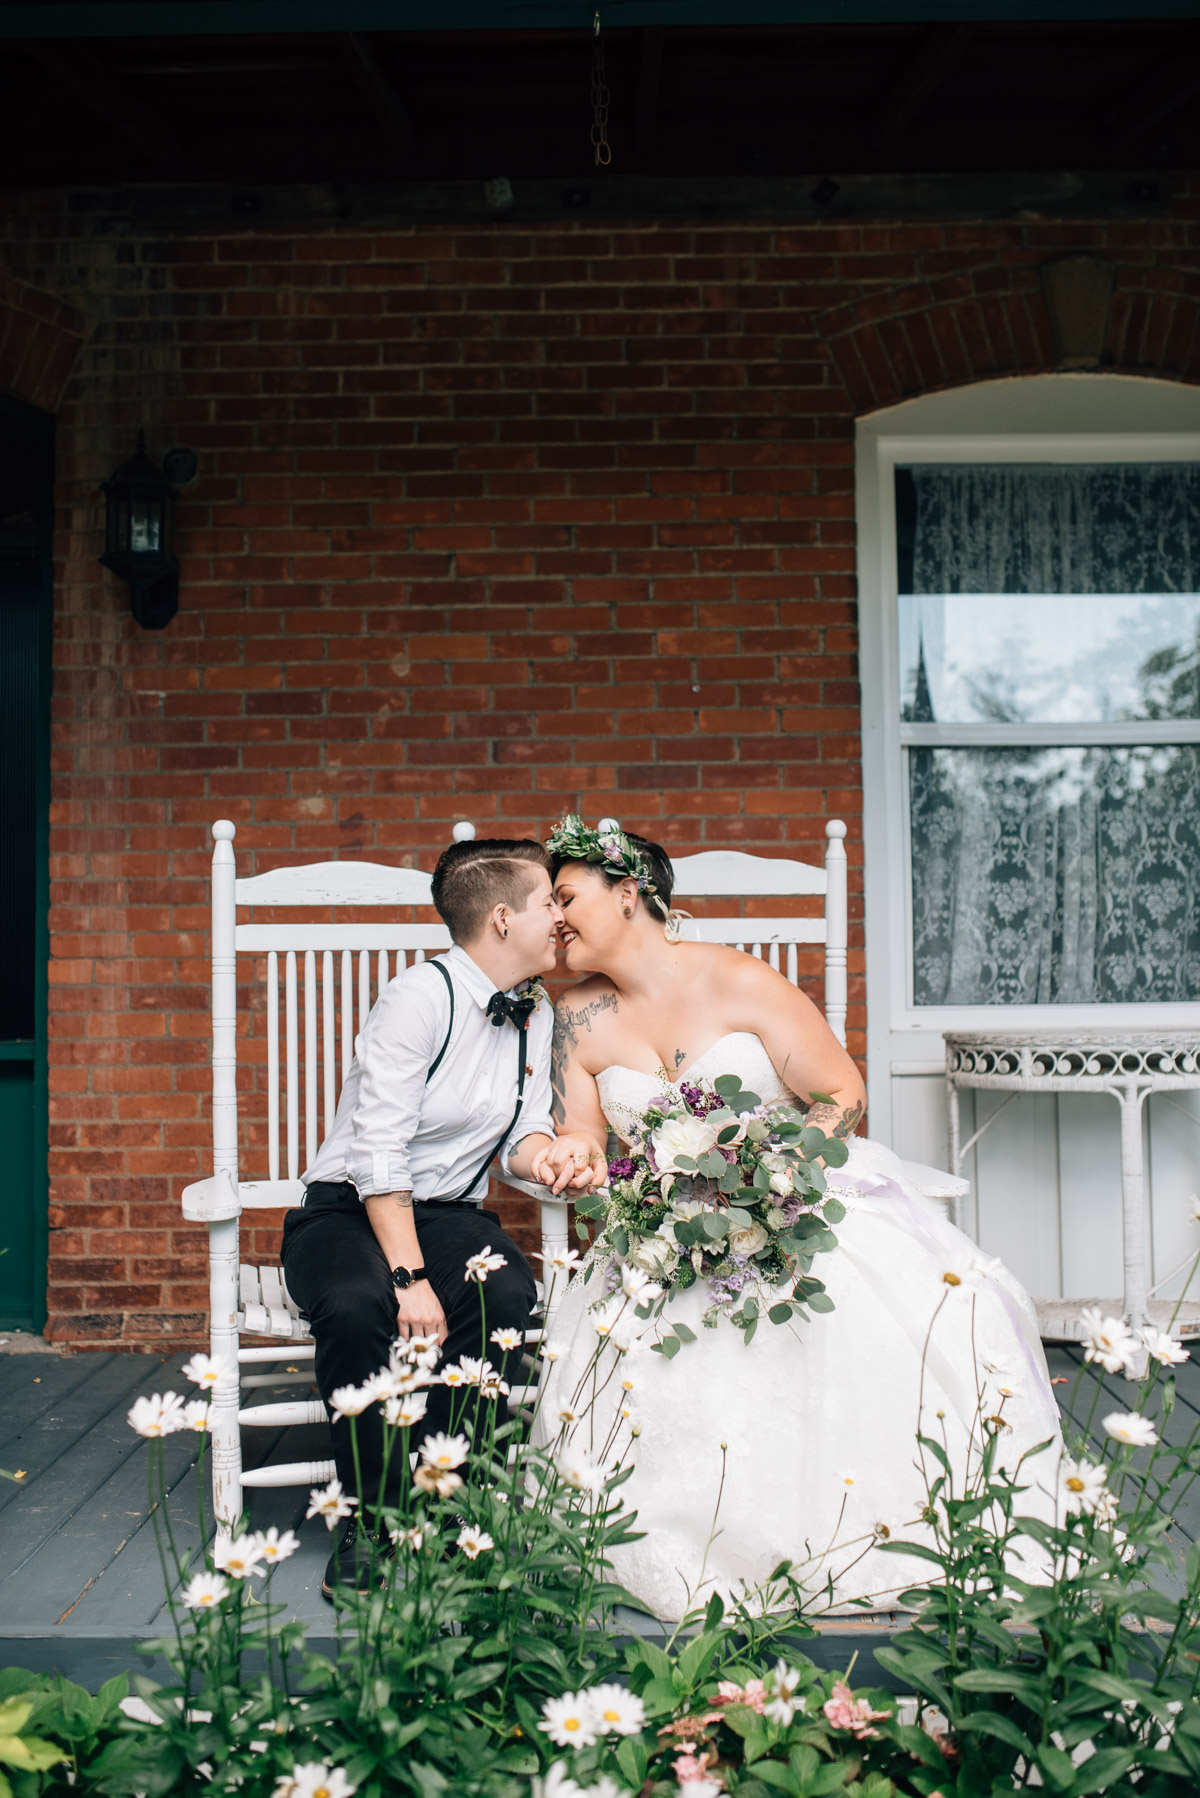 sara-wilde-photography-vineyard-bride-swish-list-beamer-falls-manor-grimsby-wedding-46.jpg